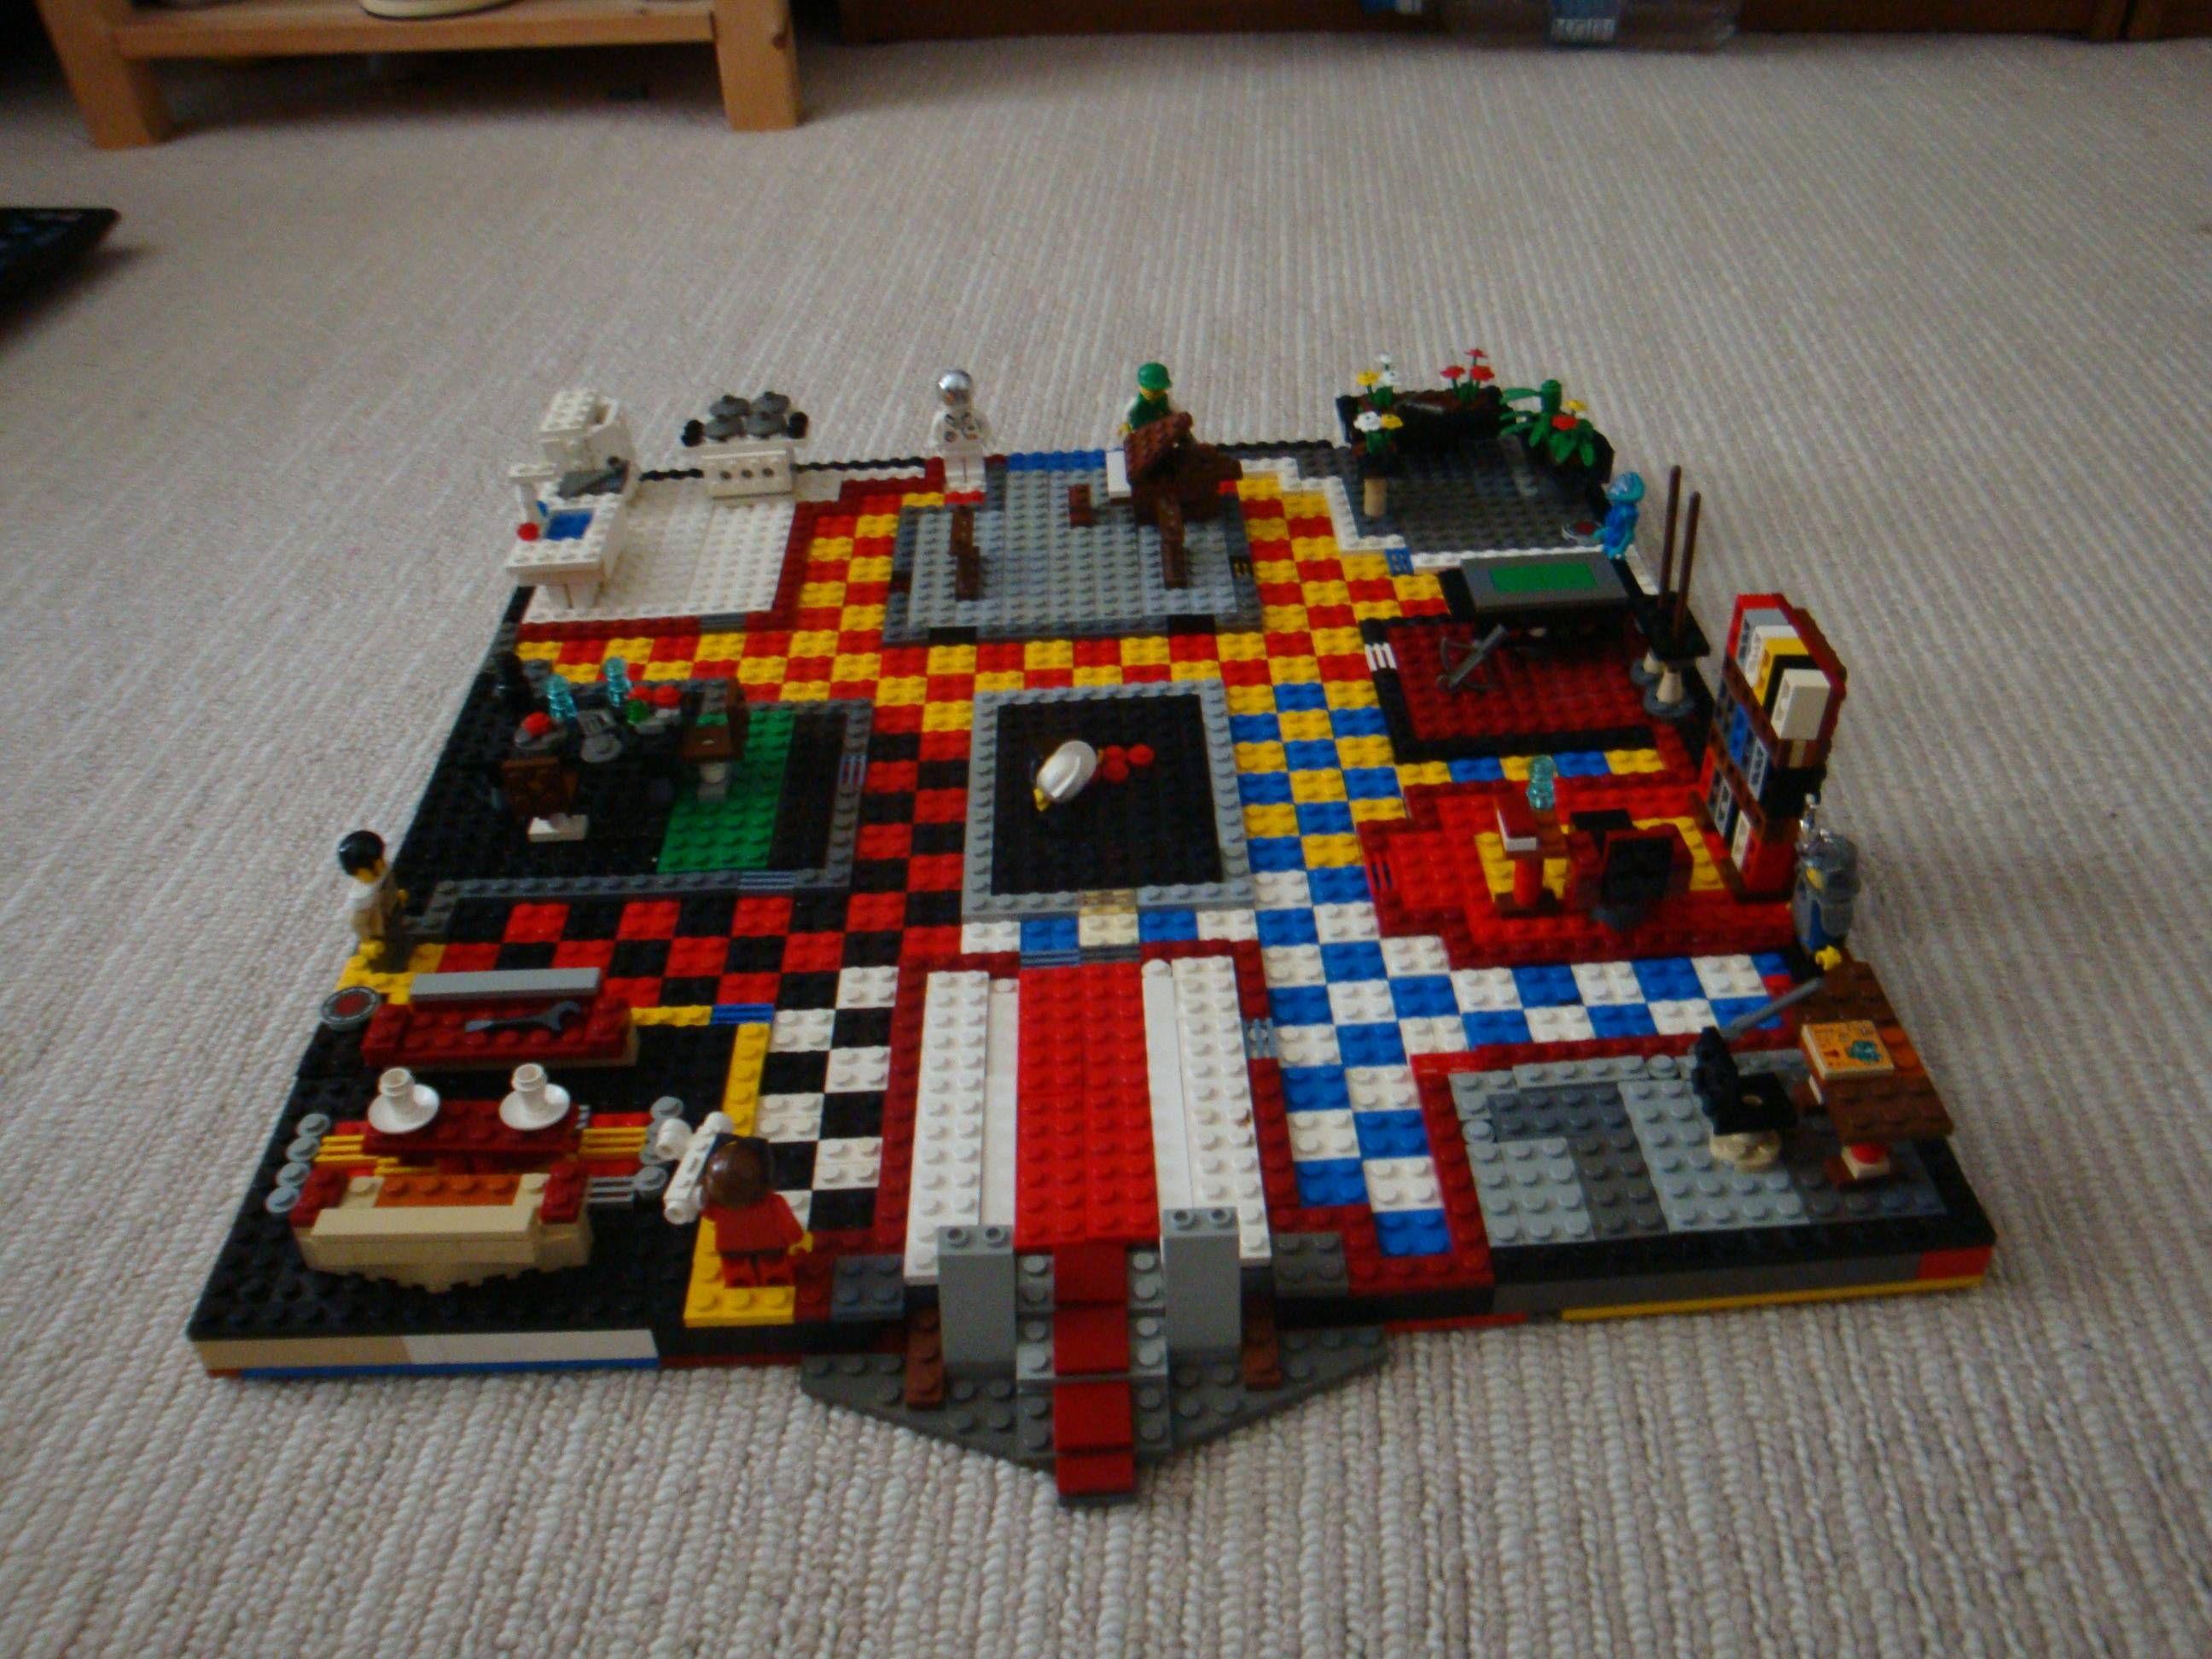 I love Clue and I love Legos. WOW! Great idea! Cool lego